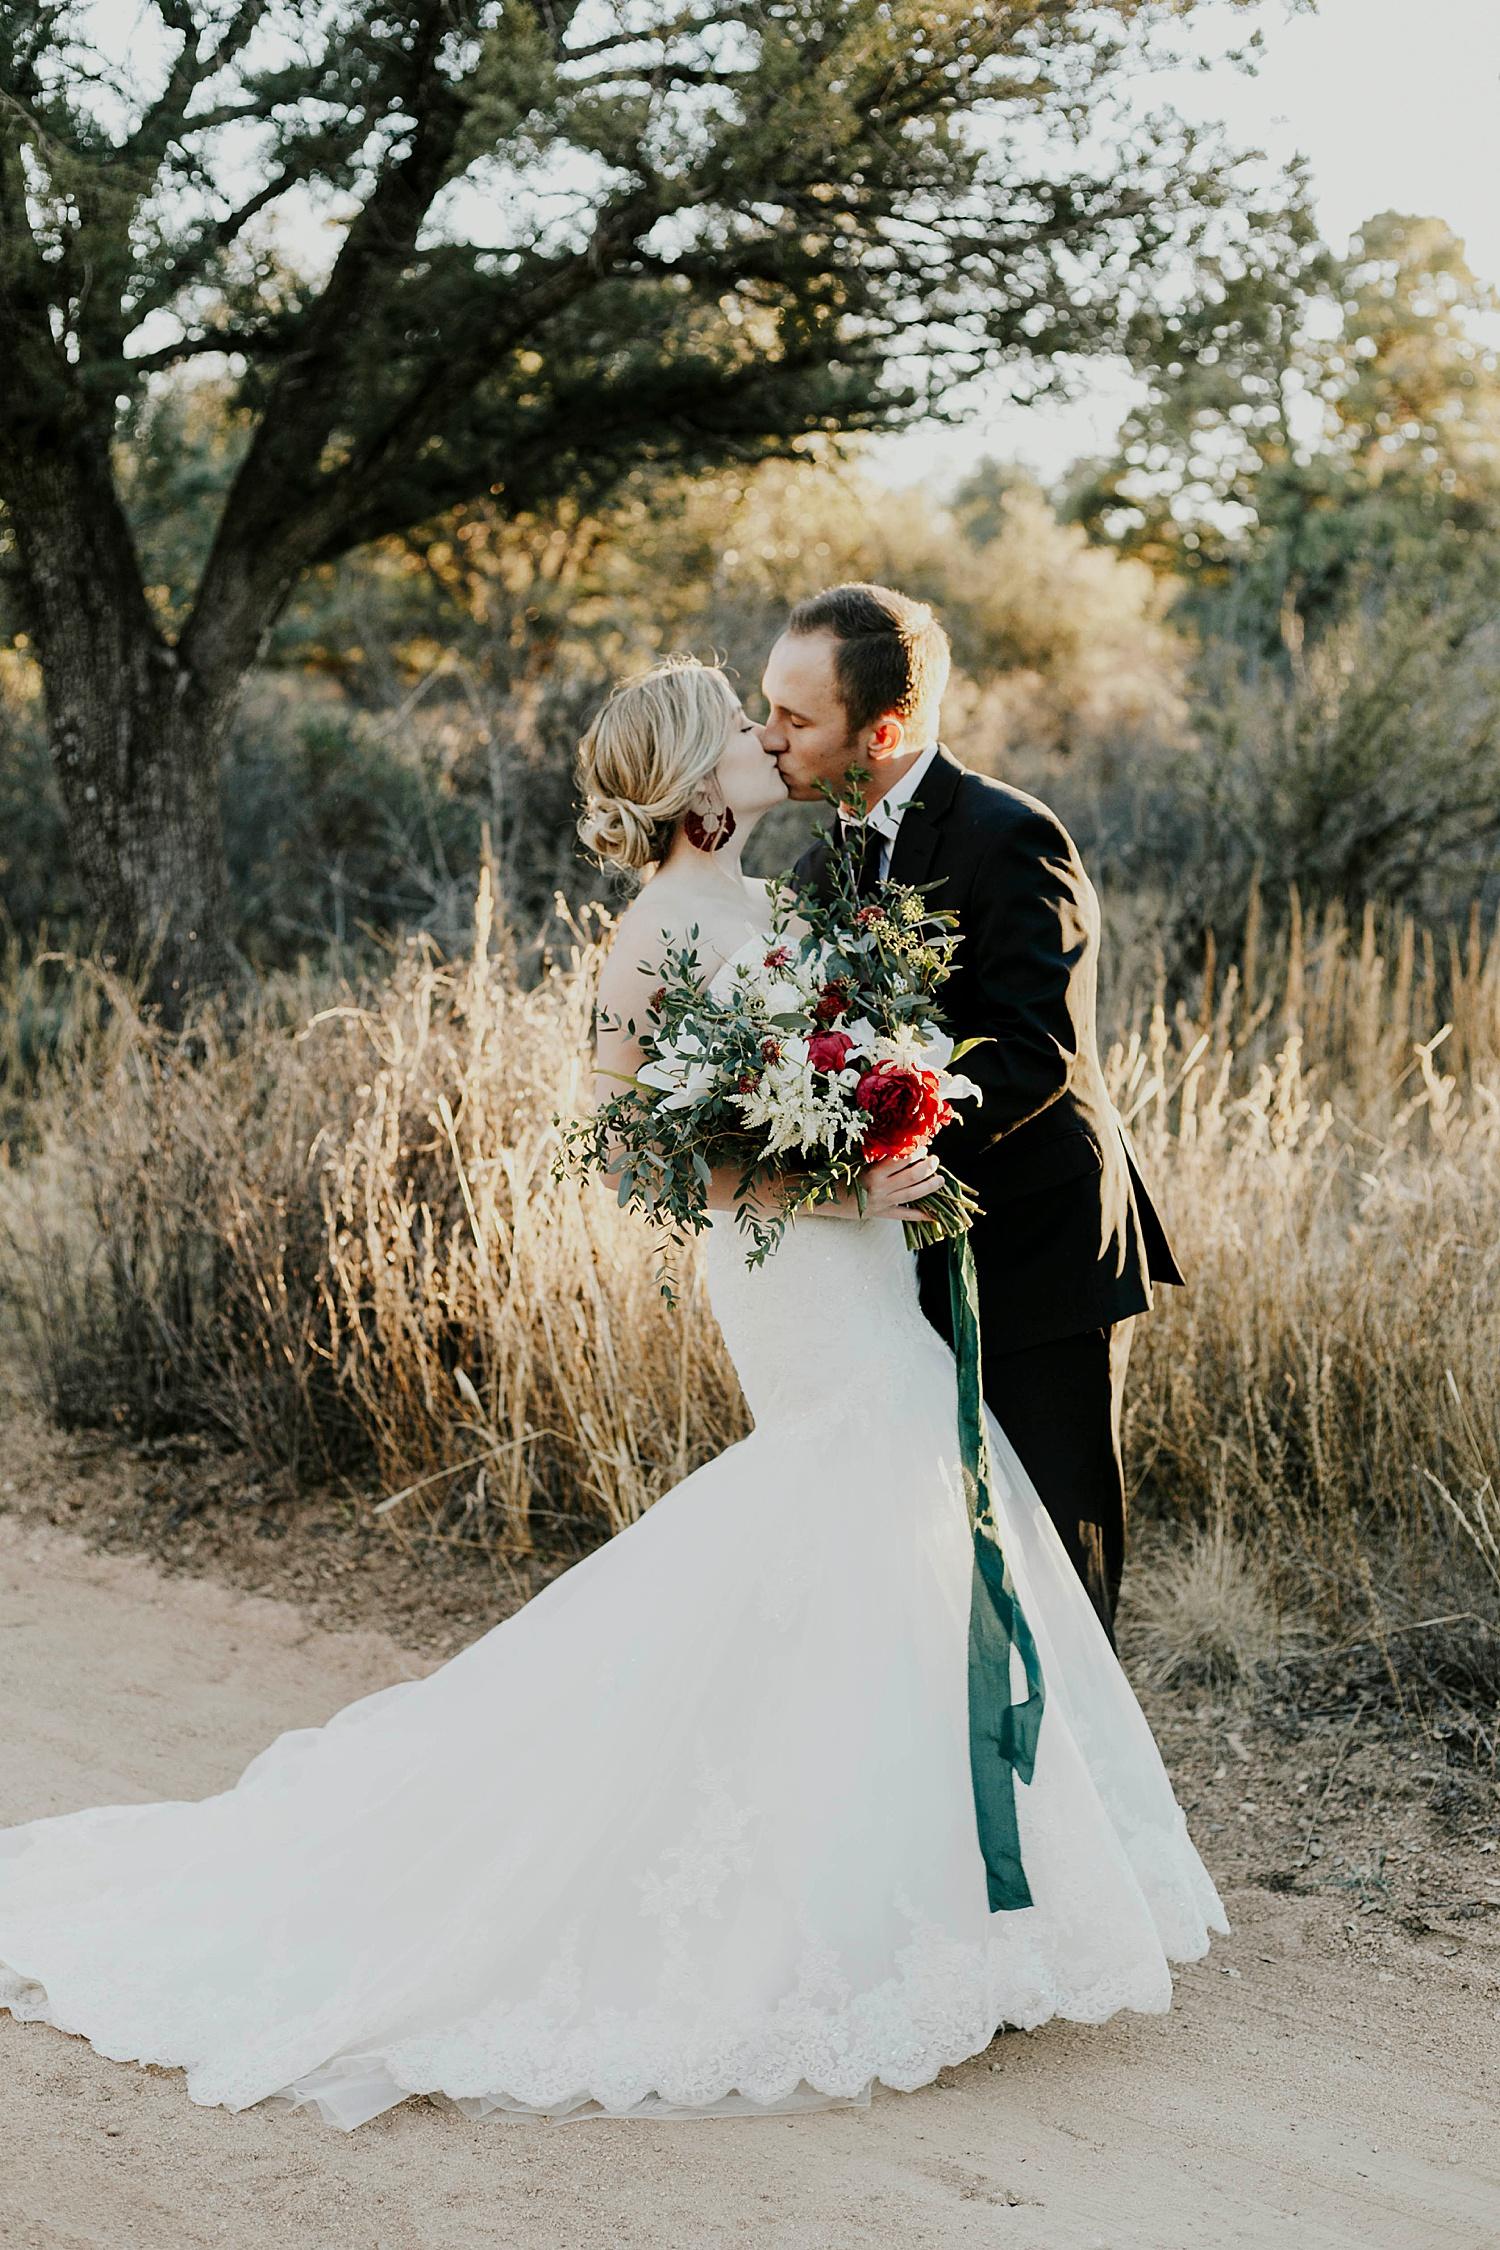 Juniper-Well-Ranch_Prescott-Arizona-Wedding_Frankely-Photography_0205.jpg